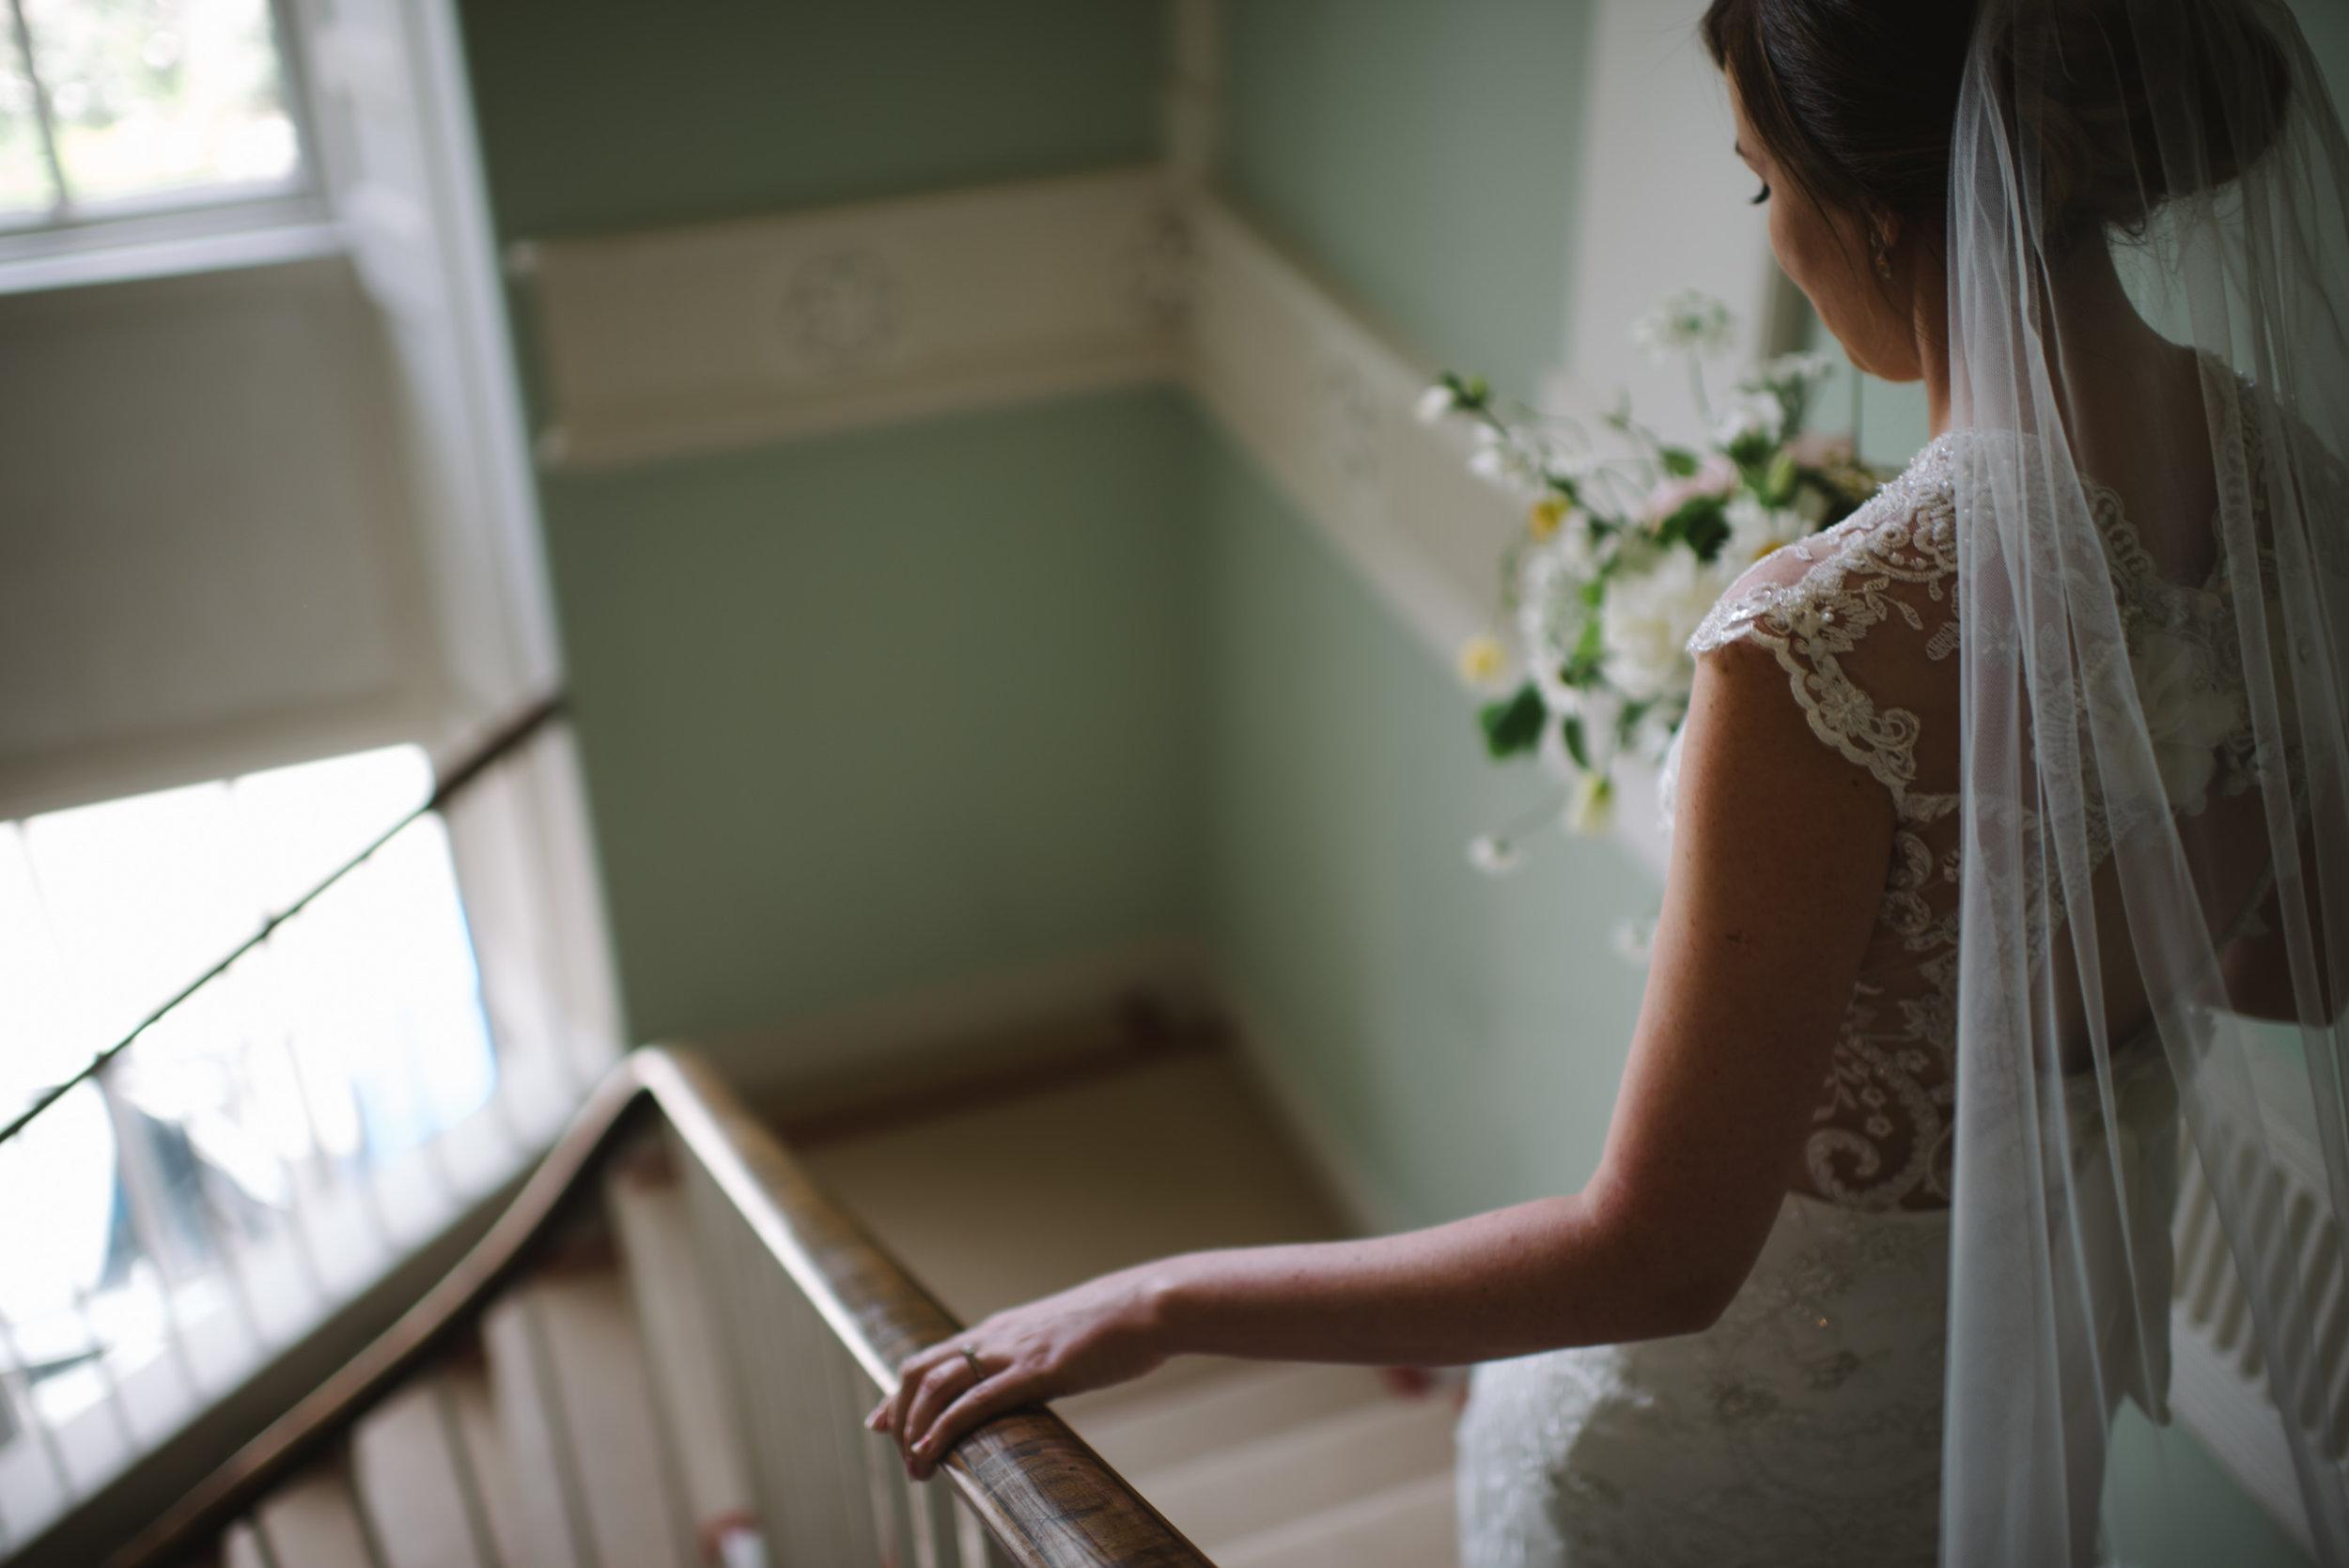 0023-LISA-DEVINE-PHOTOGRAPHY-ALTERNATIVE-WEDDING-PHOTOGRAPHY-SCOTLAND-DESTINATION-WEDDINGS-GLASGOW-WEDDINGS-COOL-WEDDINGS-STYLISH-WEDDINGS.JPG